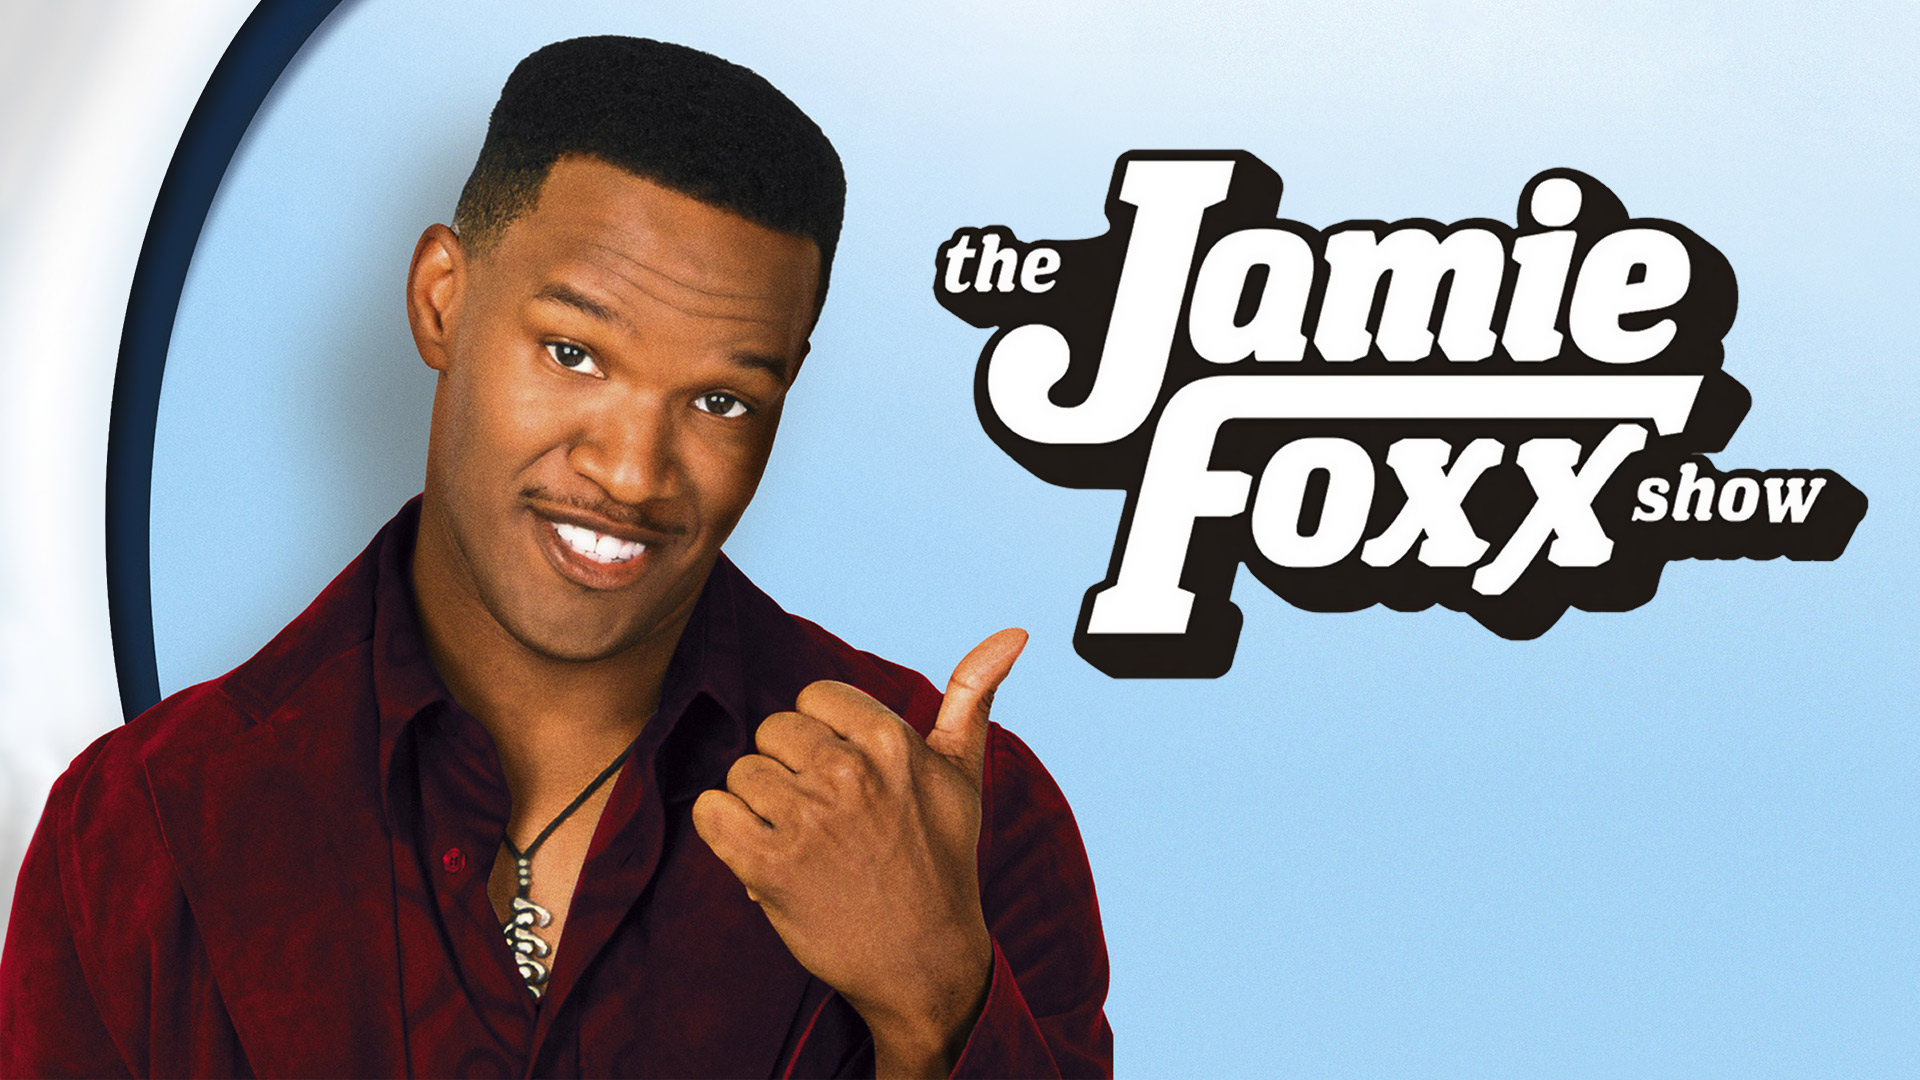 Jamie Foxx Show: The Complete First Season